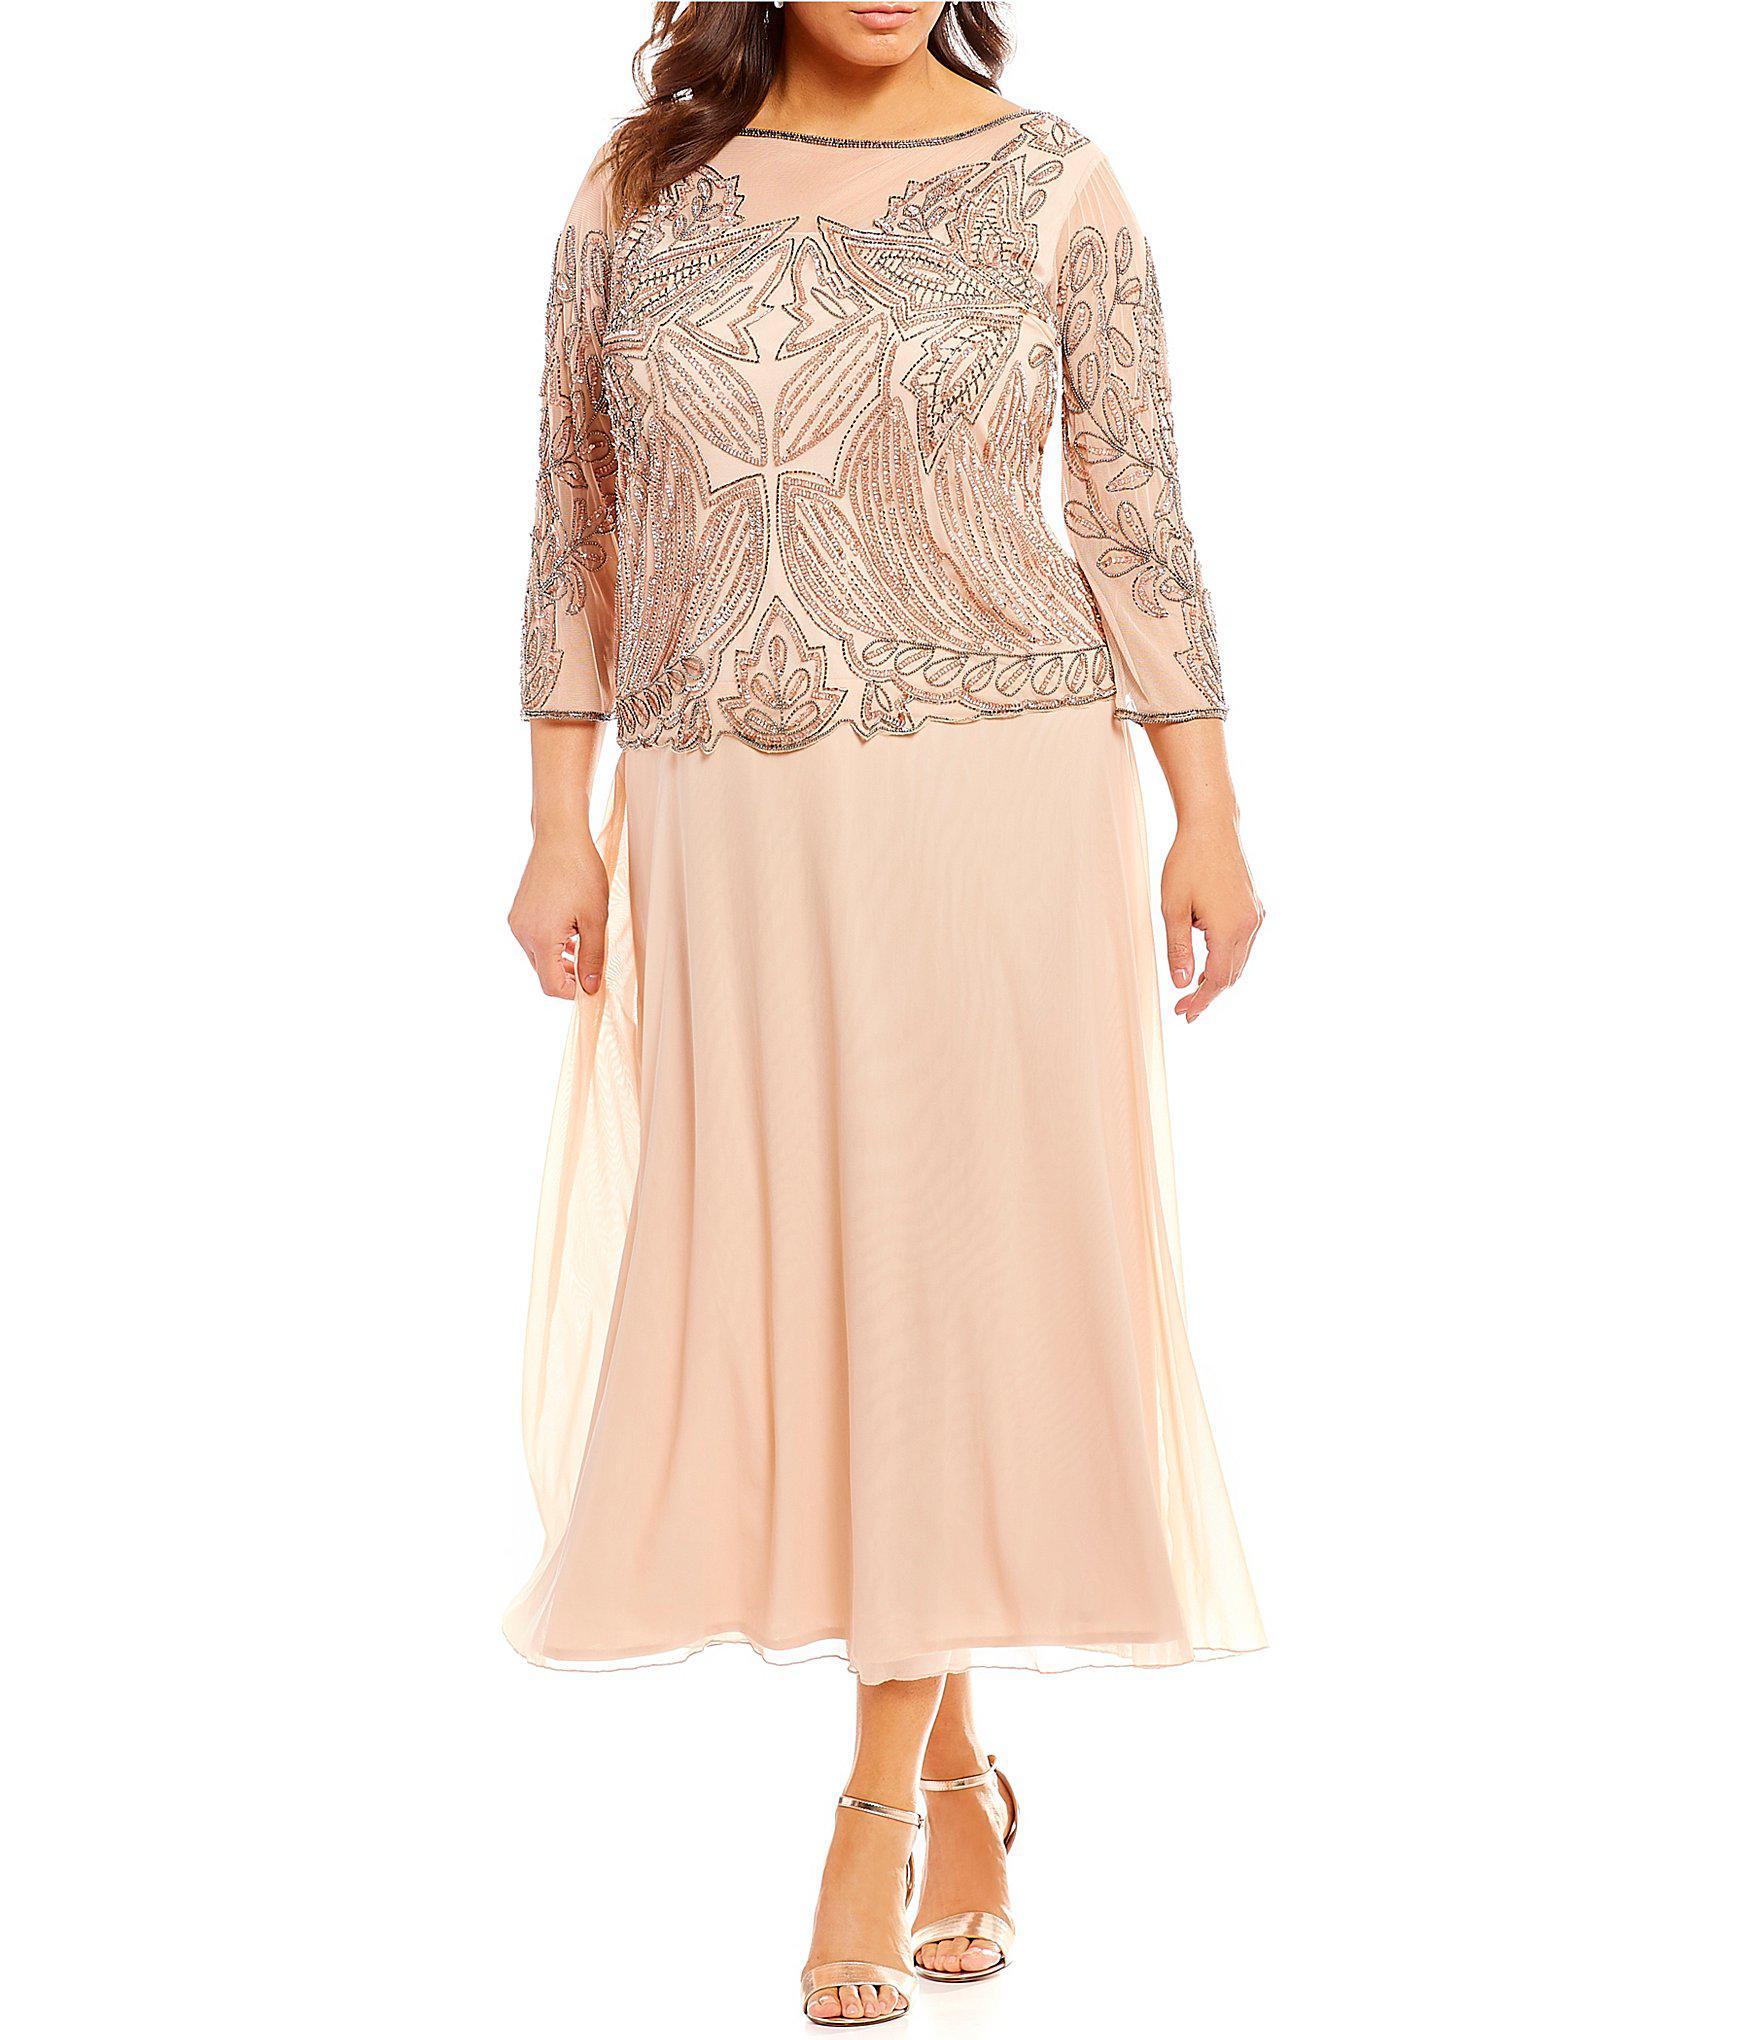 08faafa635513 Lyst - Pisarro Nights Plus Floral Beaded Bodice Mock 2-piece Dress